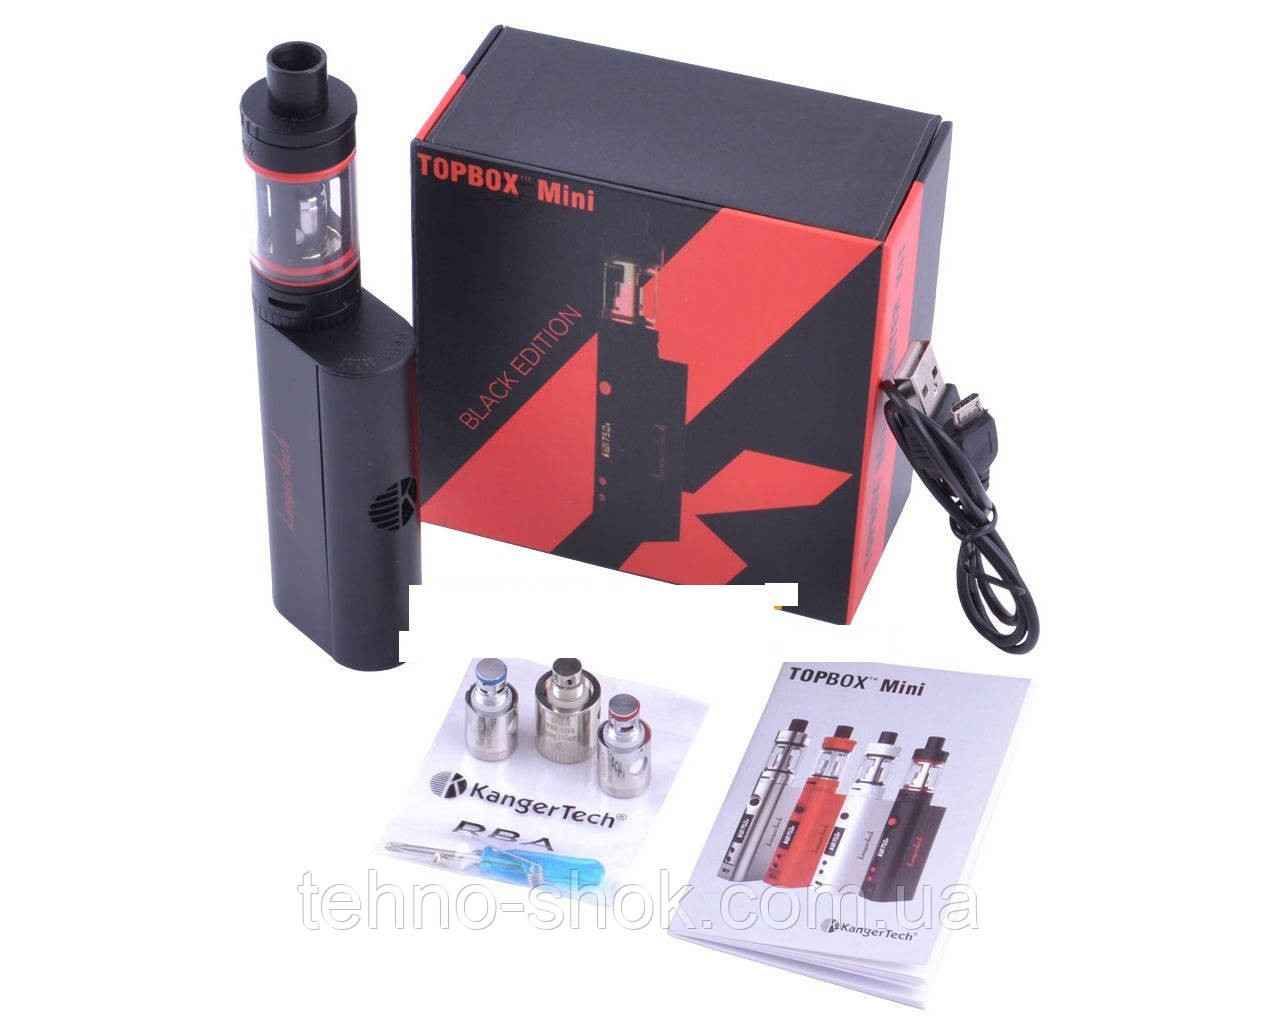 Электронная сигарета Бокс-Мод Kanger Tech TOPBOX Mini Starter Kit, Black Edition